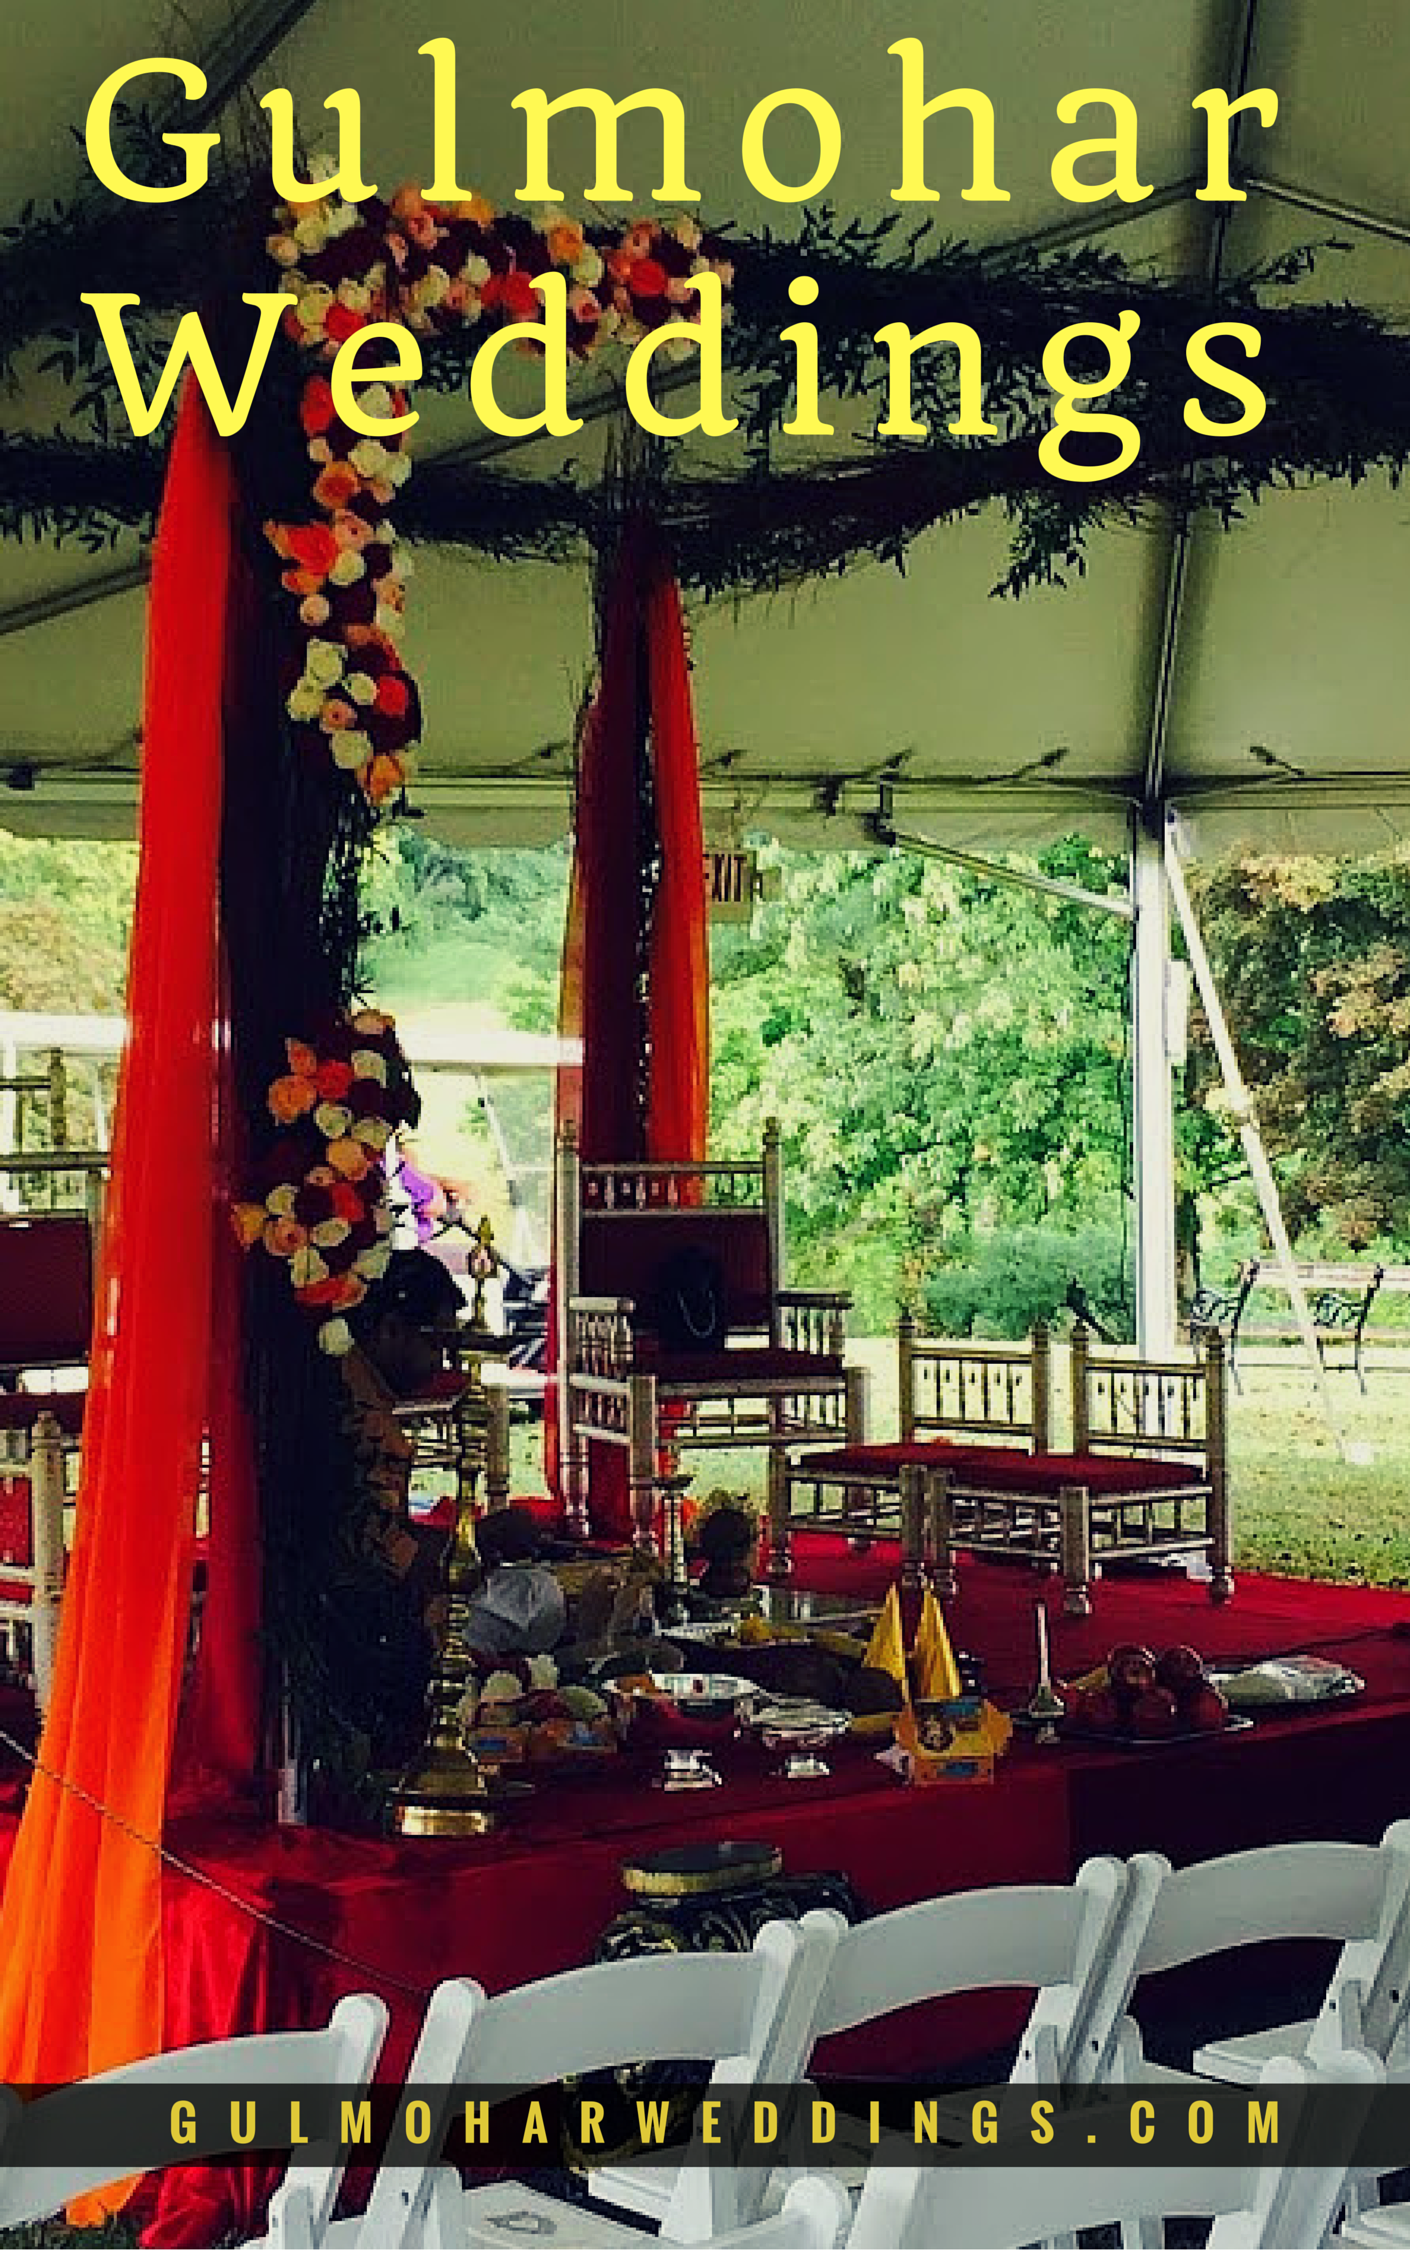 Indian Wedding Decorator In Richmond Va Indian Wedding Decorator In Virginia Beach Va Indian Wedding Decorator In Charlottesville Va Indian Wedding Planner Indian Wedding Decorations Yacht Wedding